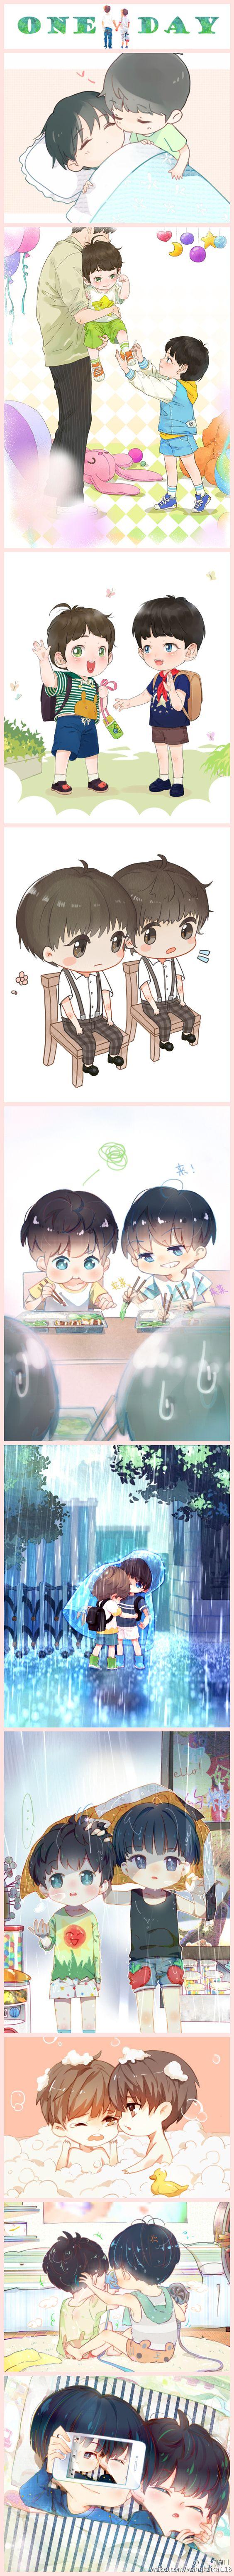 丨王凯凯丨 's Weibo_Weibo: